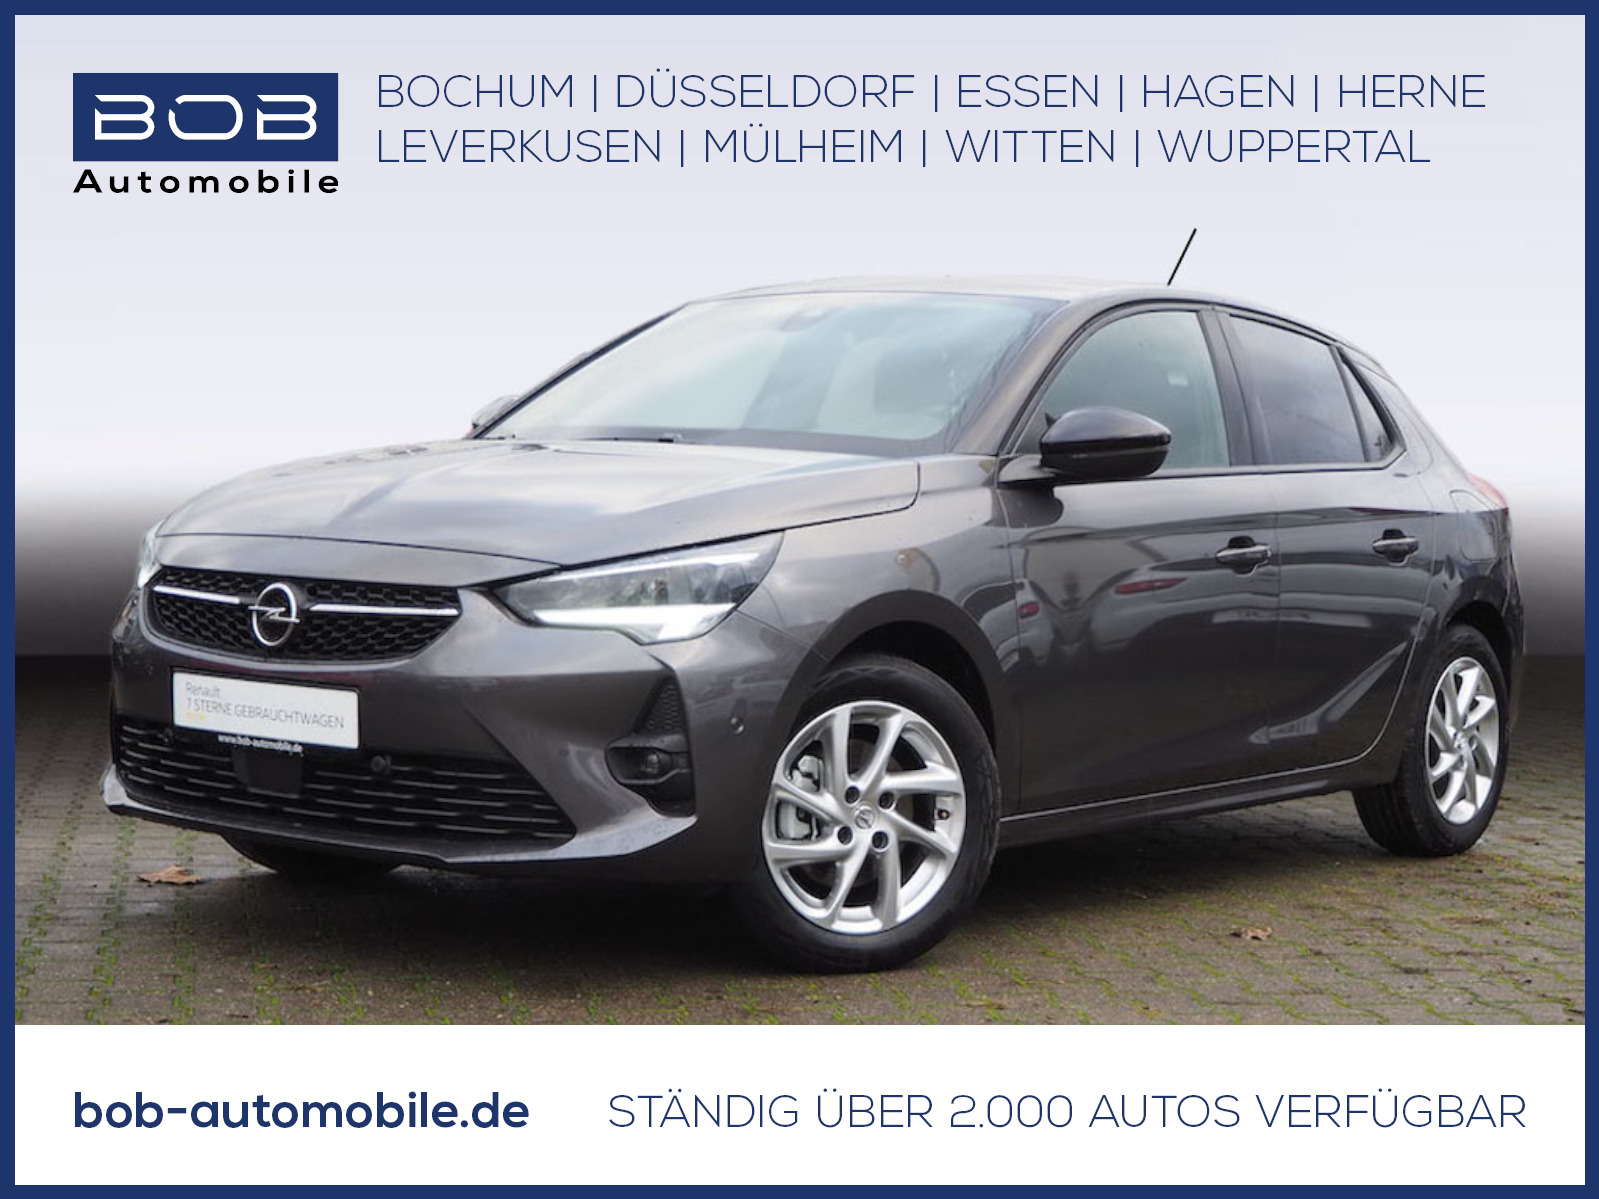 Opel Corsa 1.2 Direct Injetion GS Line PDC KLIMA ALU, Jahr 2020, Benzin